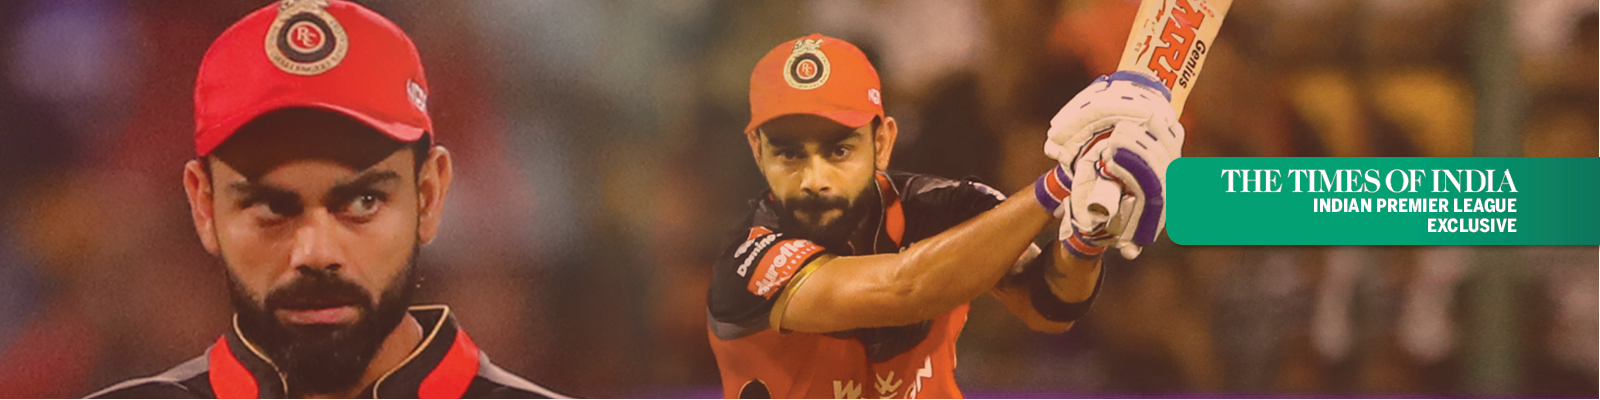 Batsman with most runs in IPL History